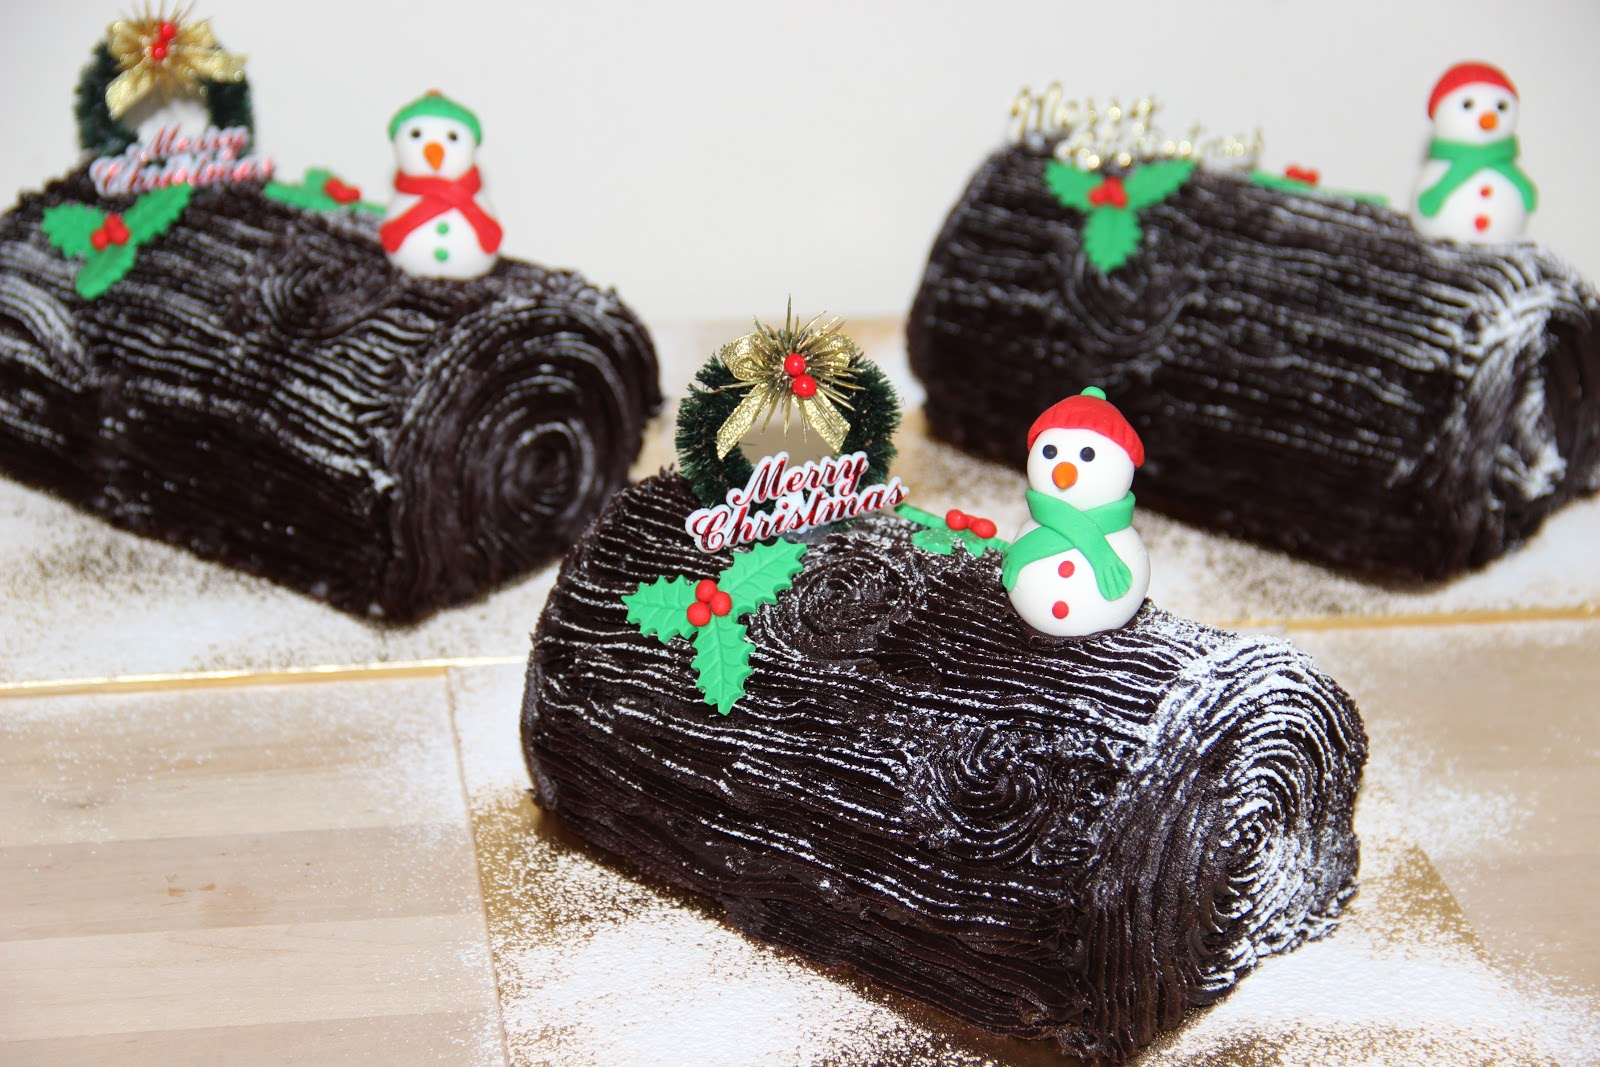 Temptations: Chocolate Yule log Cake